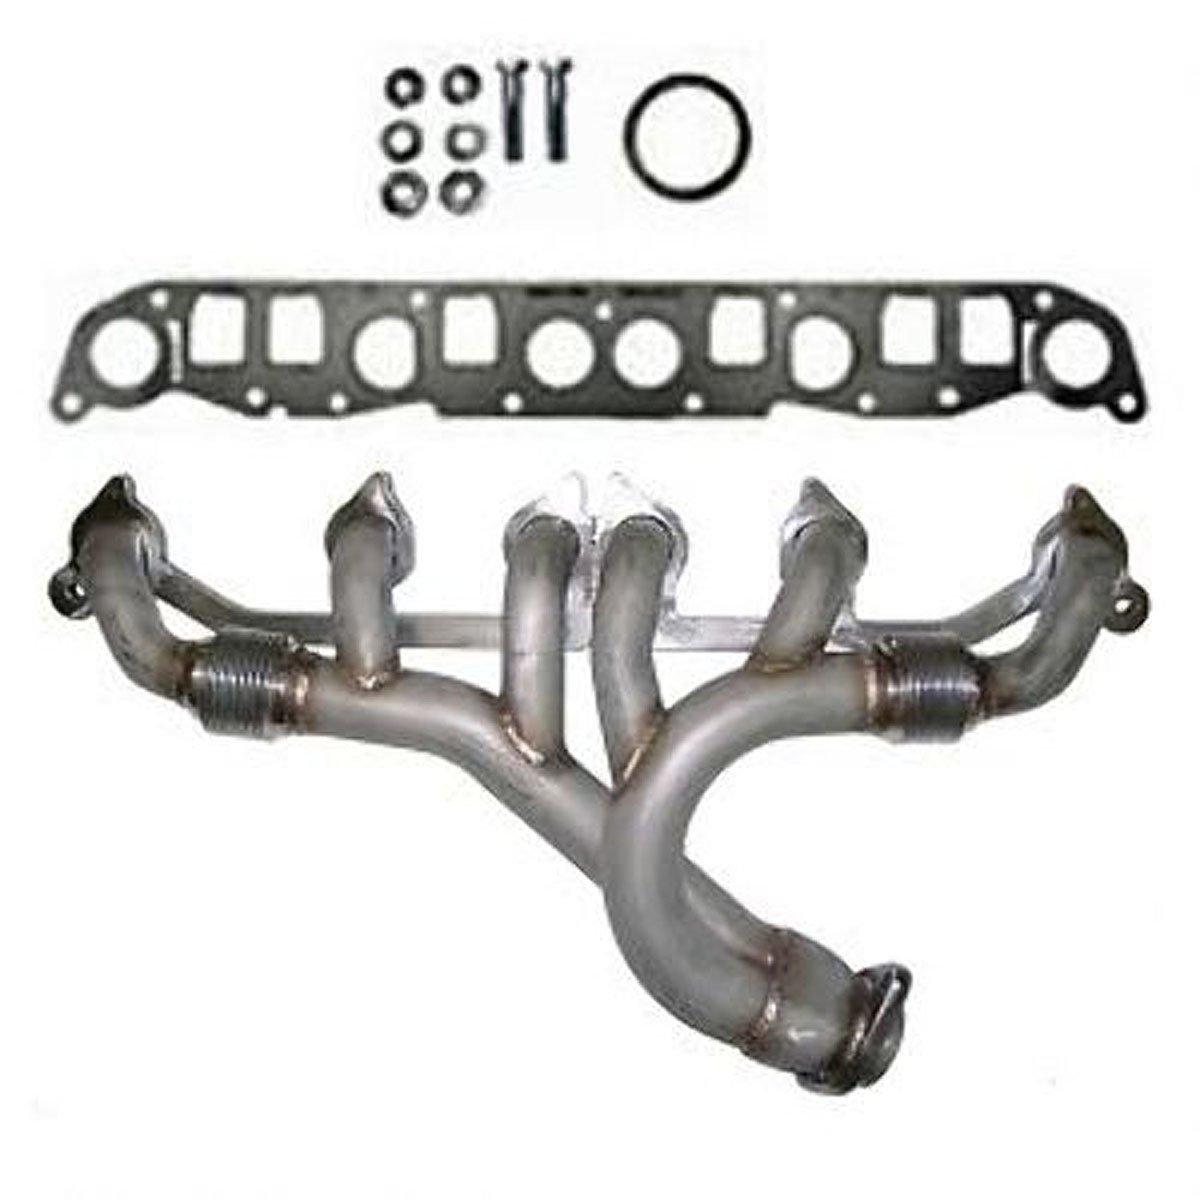 Amazon.com: 91-99 Jeep Wrangler 4.0L Exhaust Manifold & Gaskets: Automotive